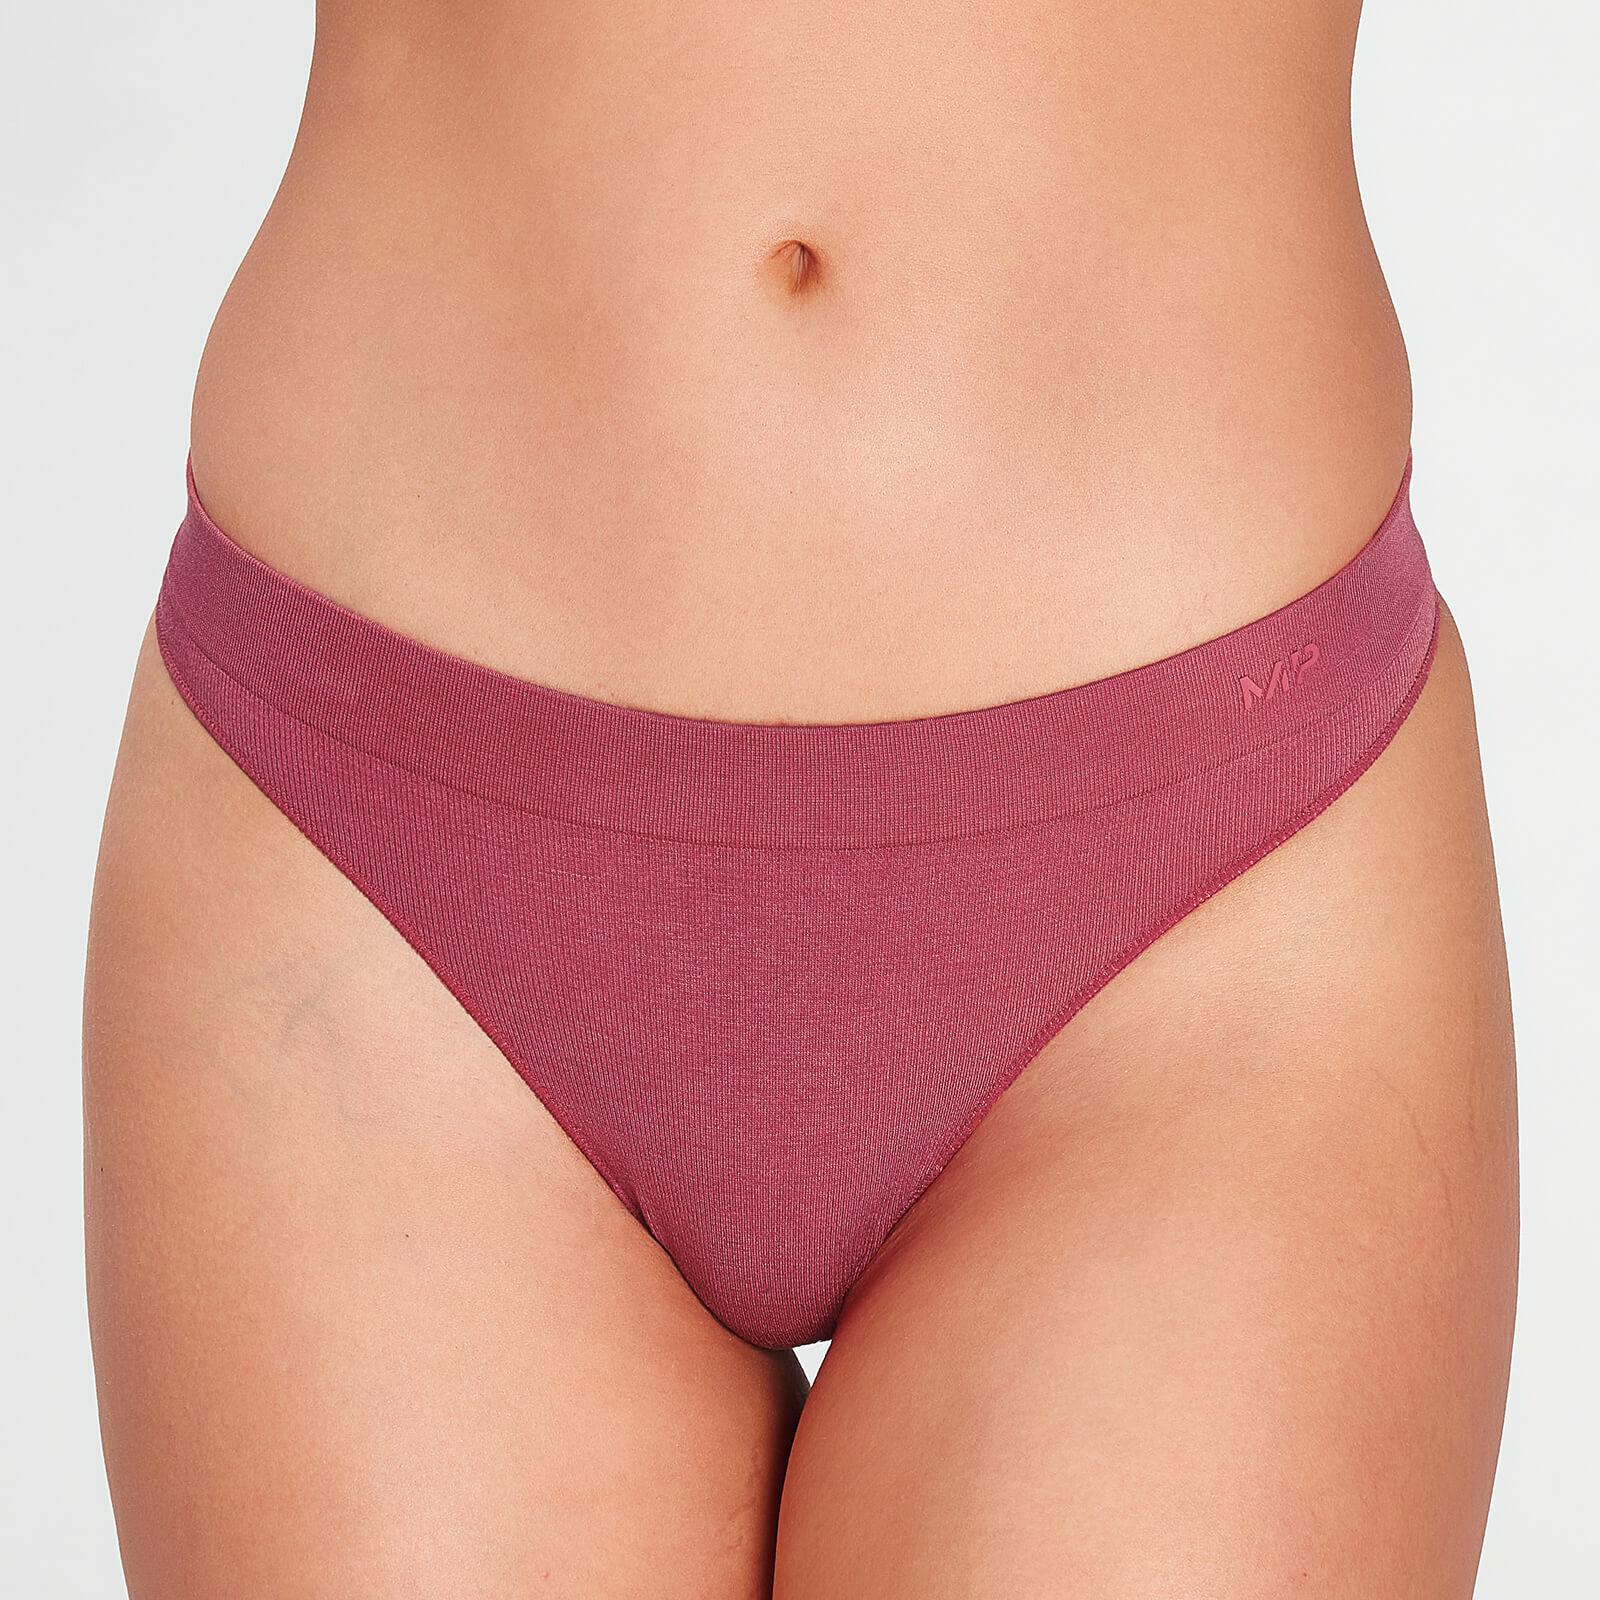 Купить MP Women's Composure Seamless Thong - Berry Pink - XS, Myprotein International